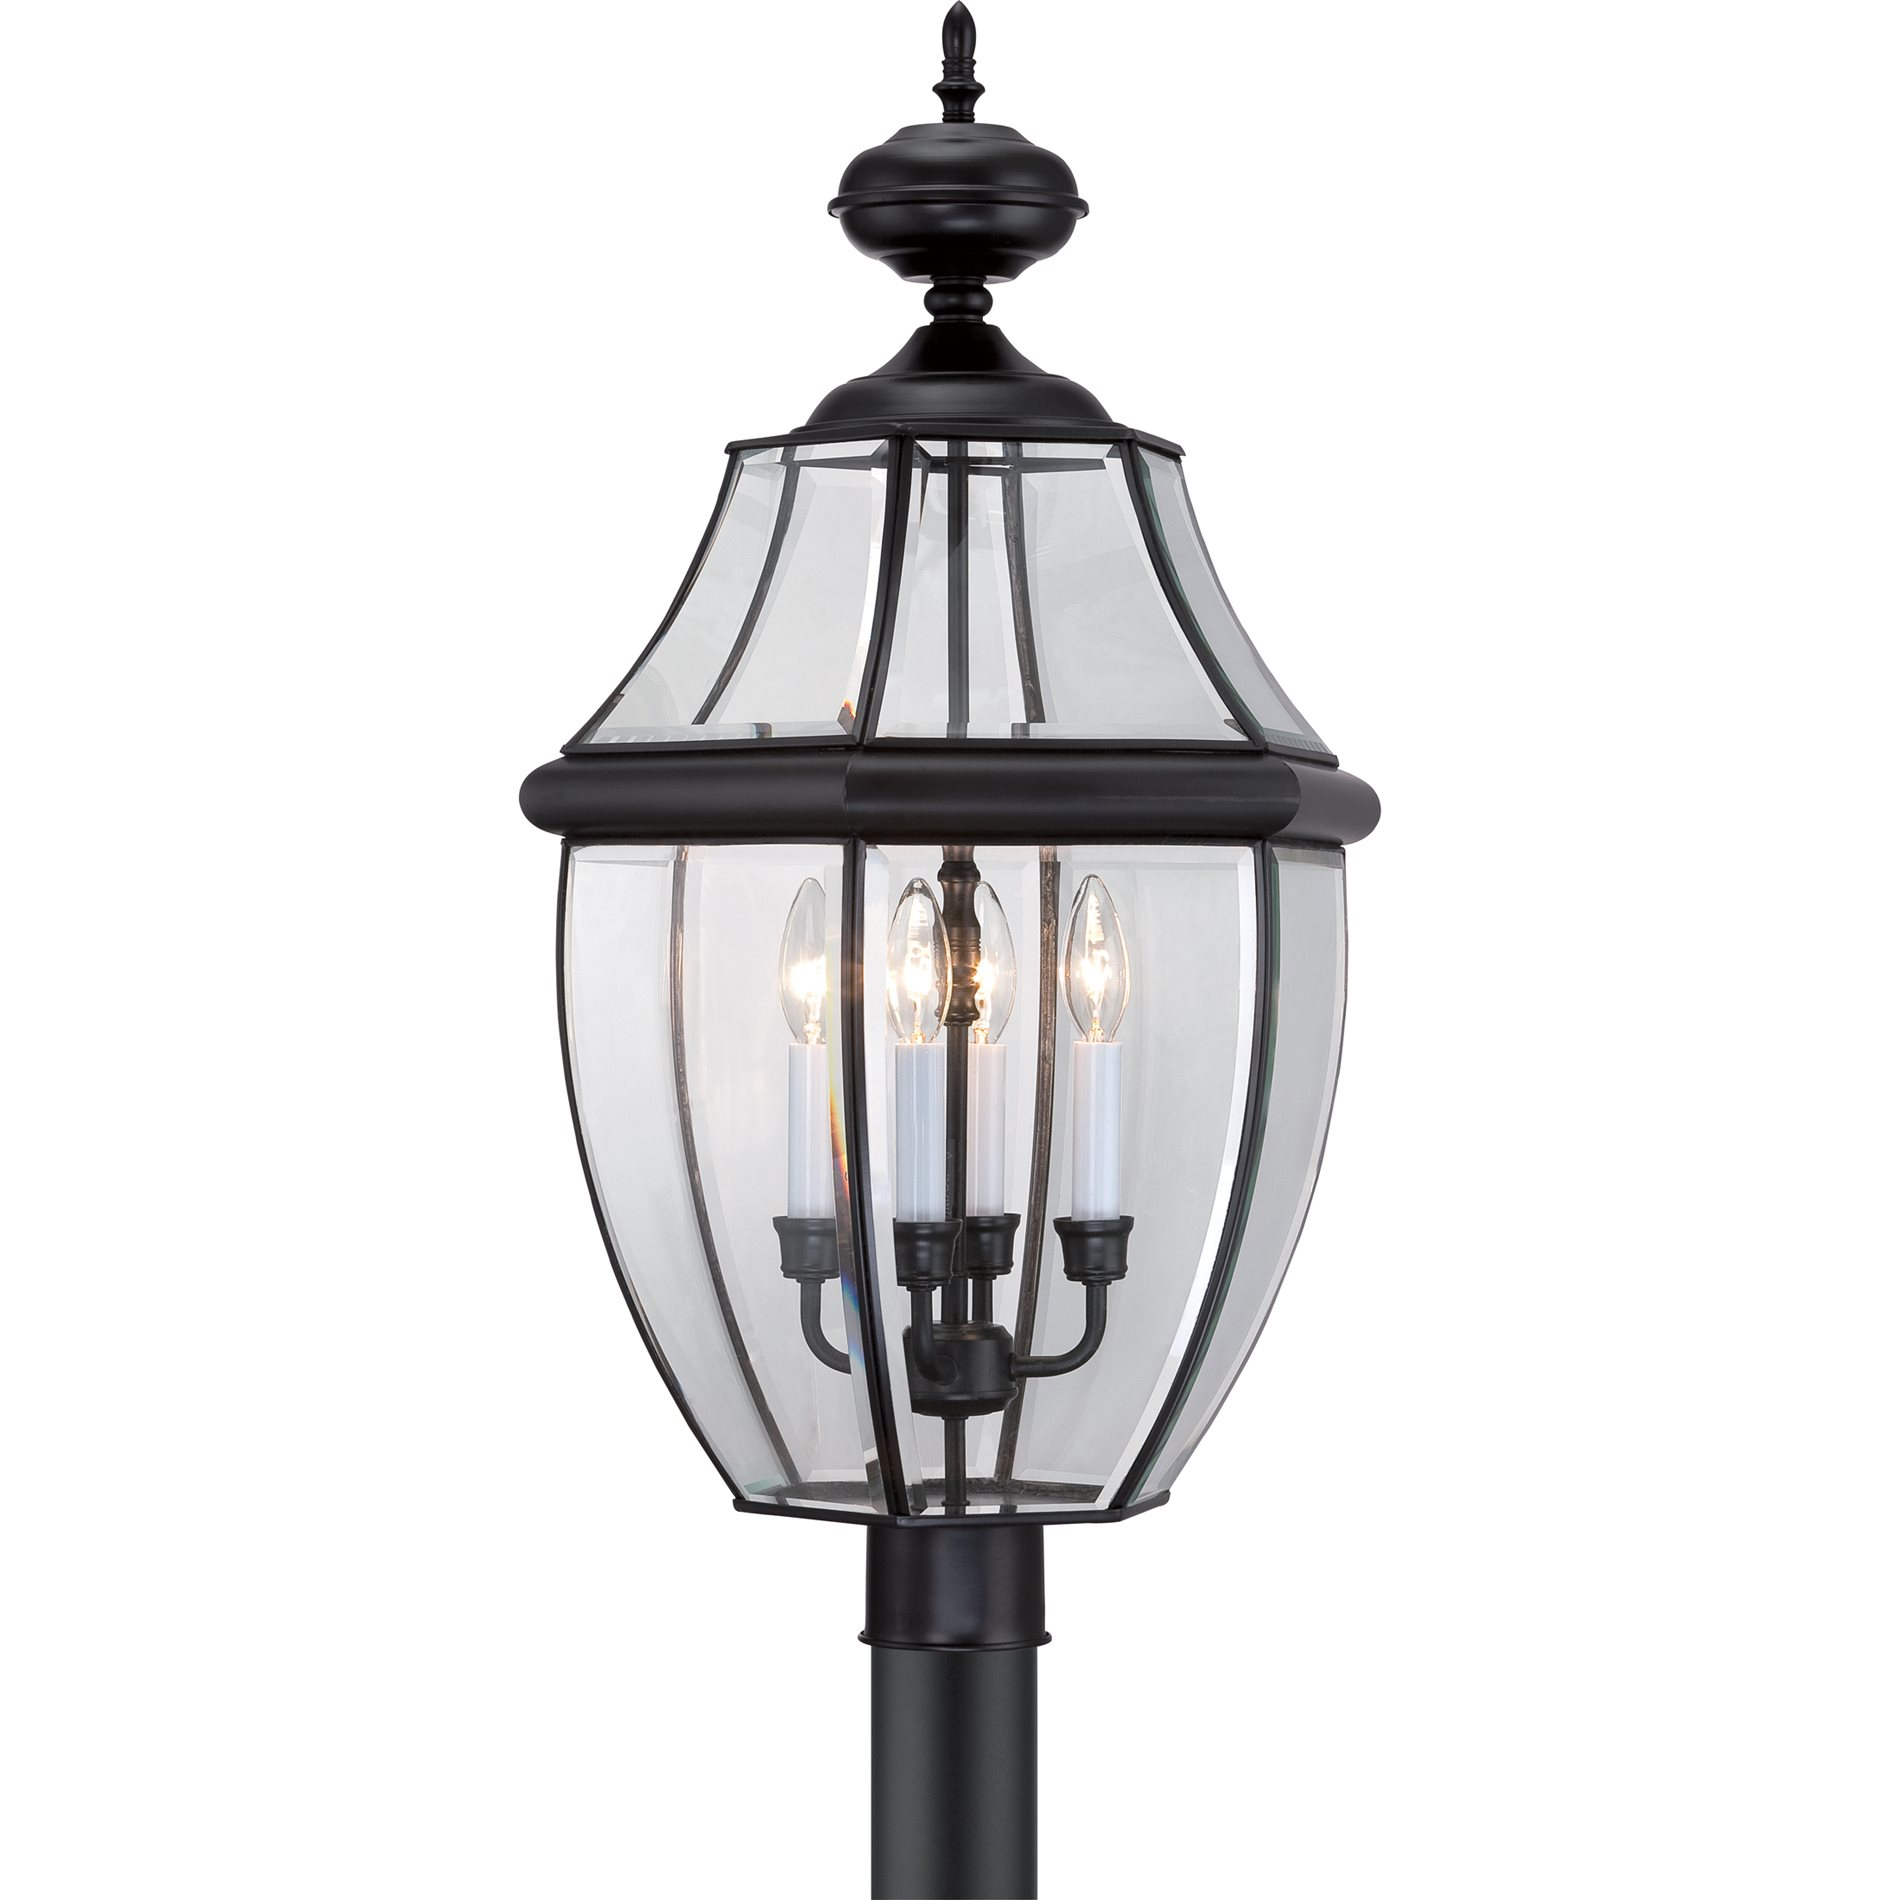 Quoizel Outdoor Lighting Newbury: Quoizel NY9045K Newbury Traditional Outdoor Post Lantern